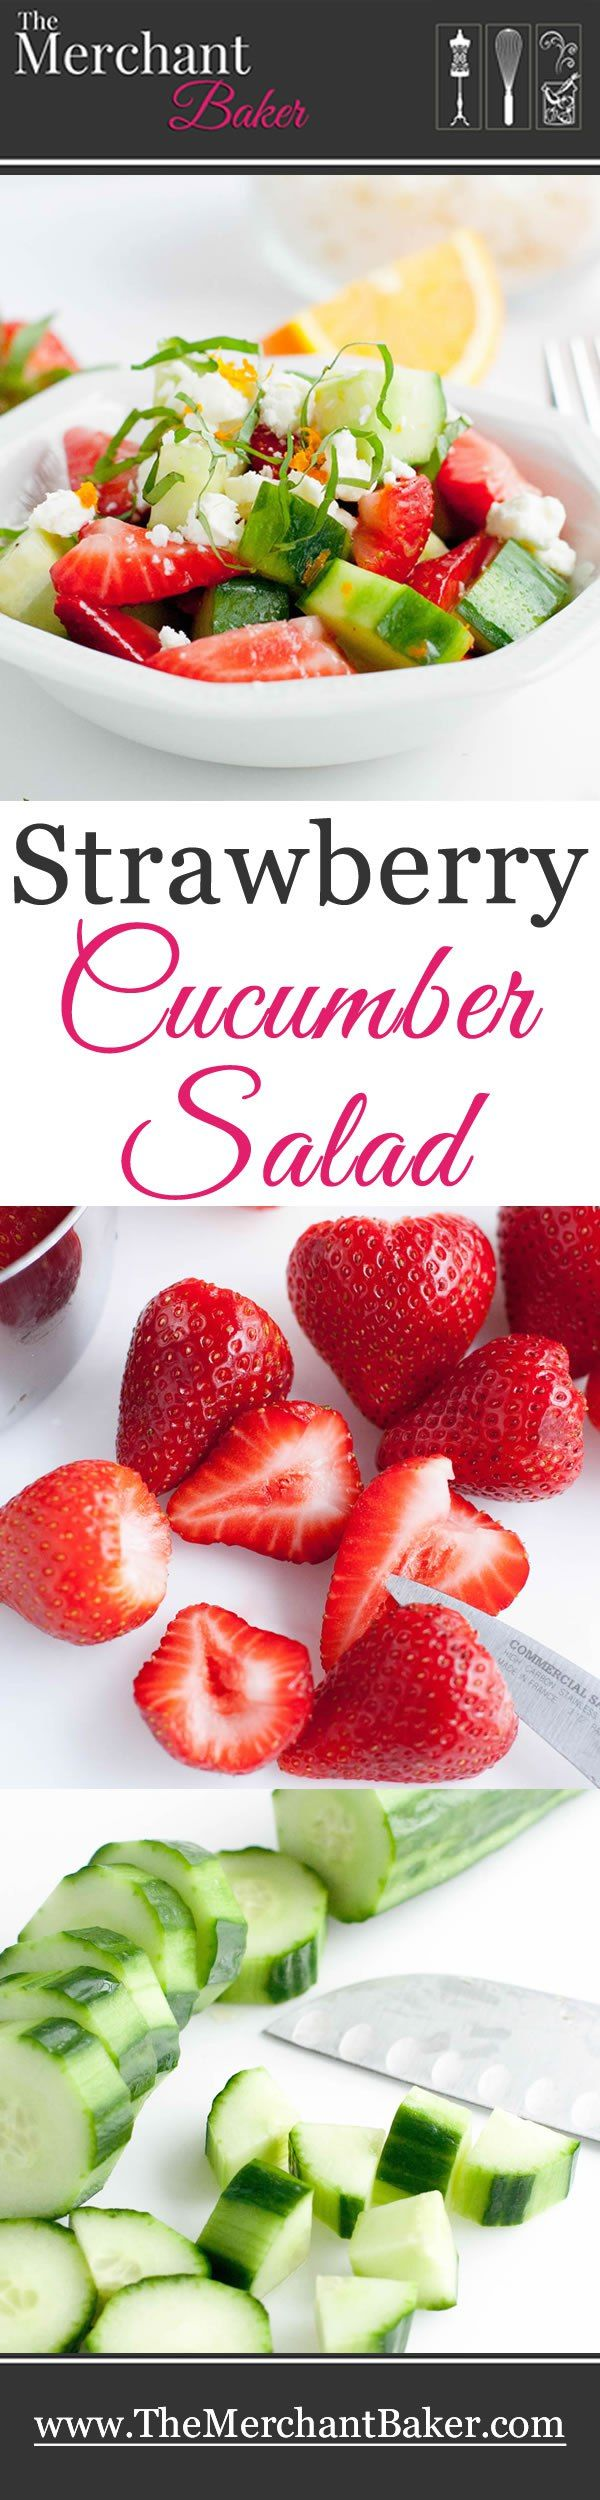 Strawberry Cucumber Salad Recipe Summer Salads Cucumber Salad Healthy Recipes